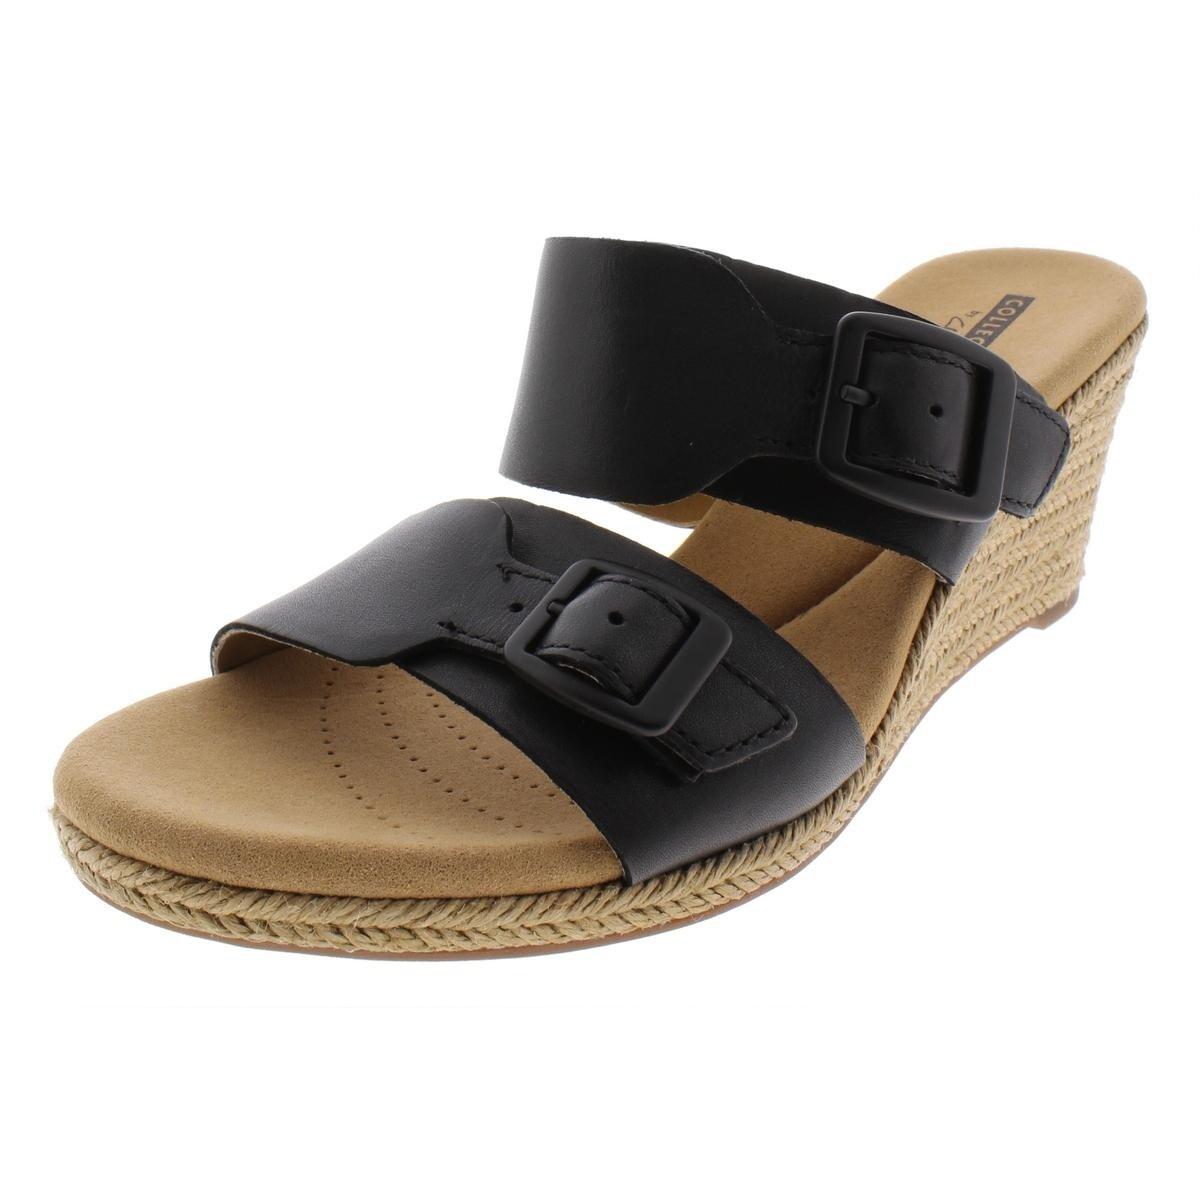 00b41ed6fbd Clarks Womens Lafley Devin Espadrilles Leather Sandals